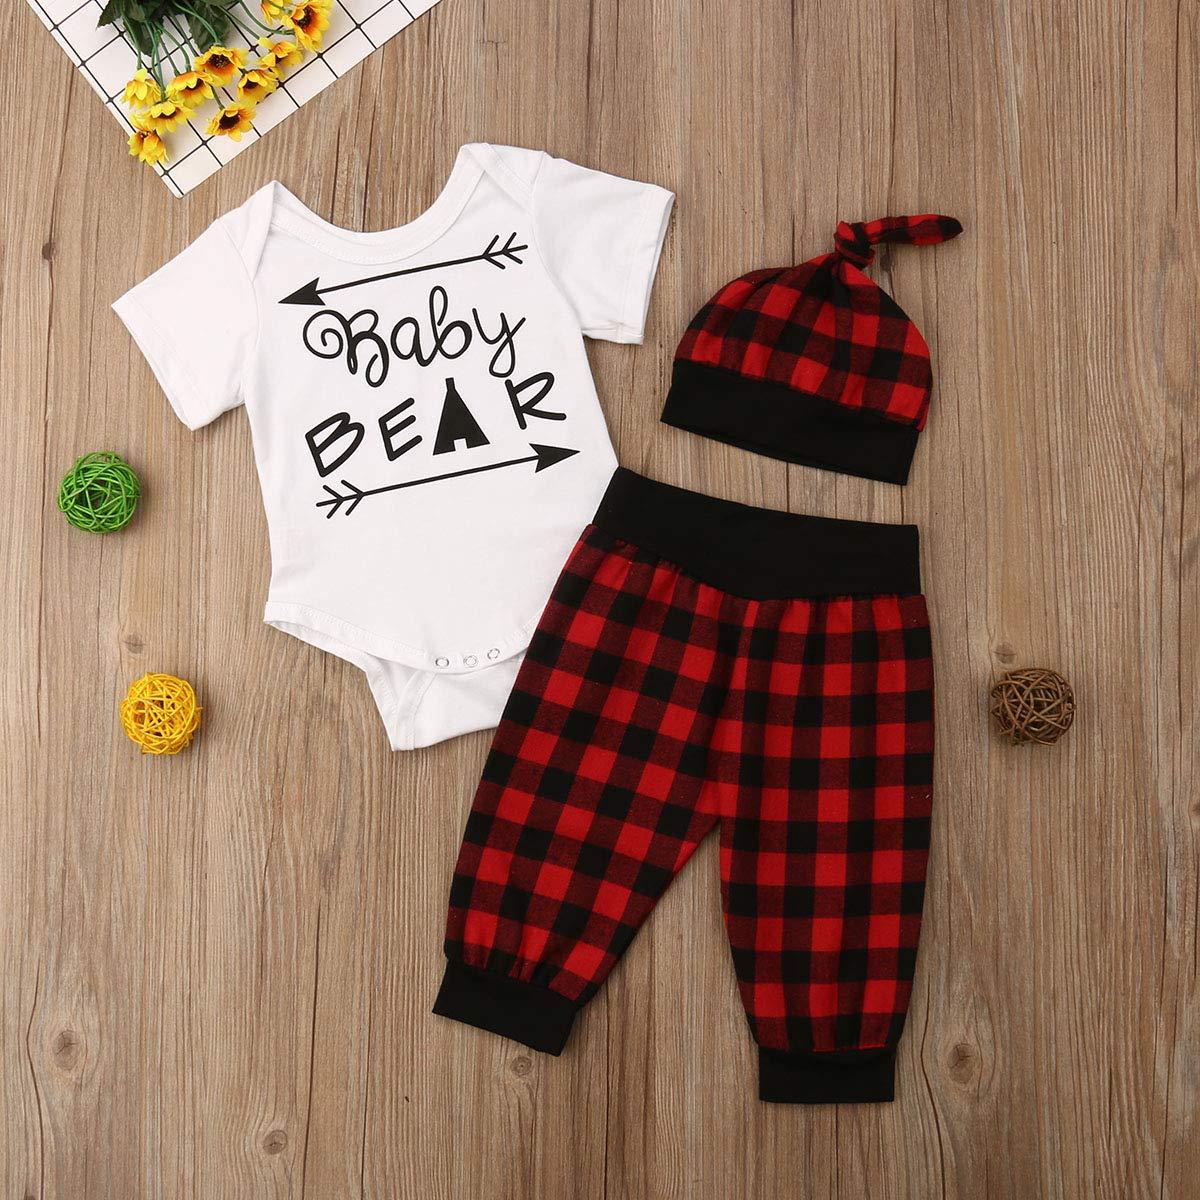 Honganda 3Pcs Newborn Infant Baby Girl Boy Baby Bear Romper Bodysuit+Plaid Pants+Hat Outfit Set